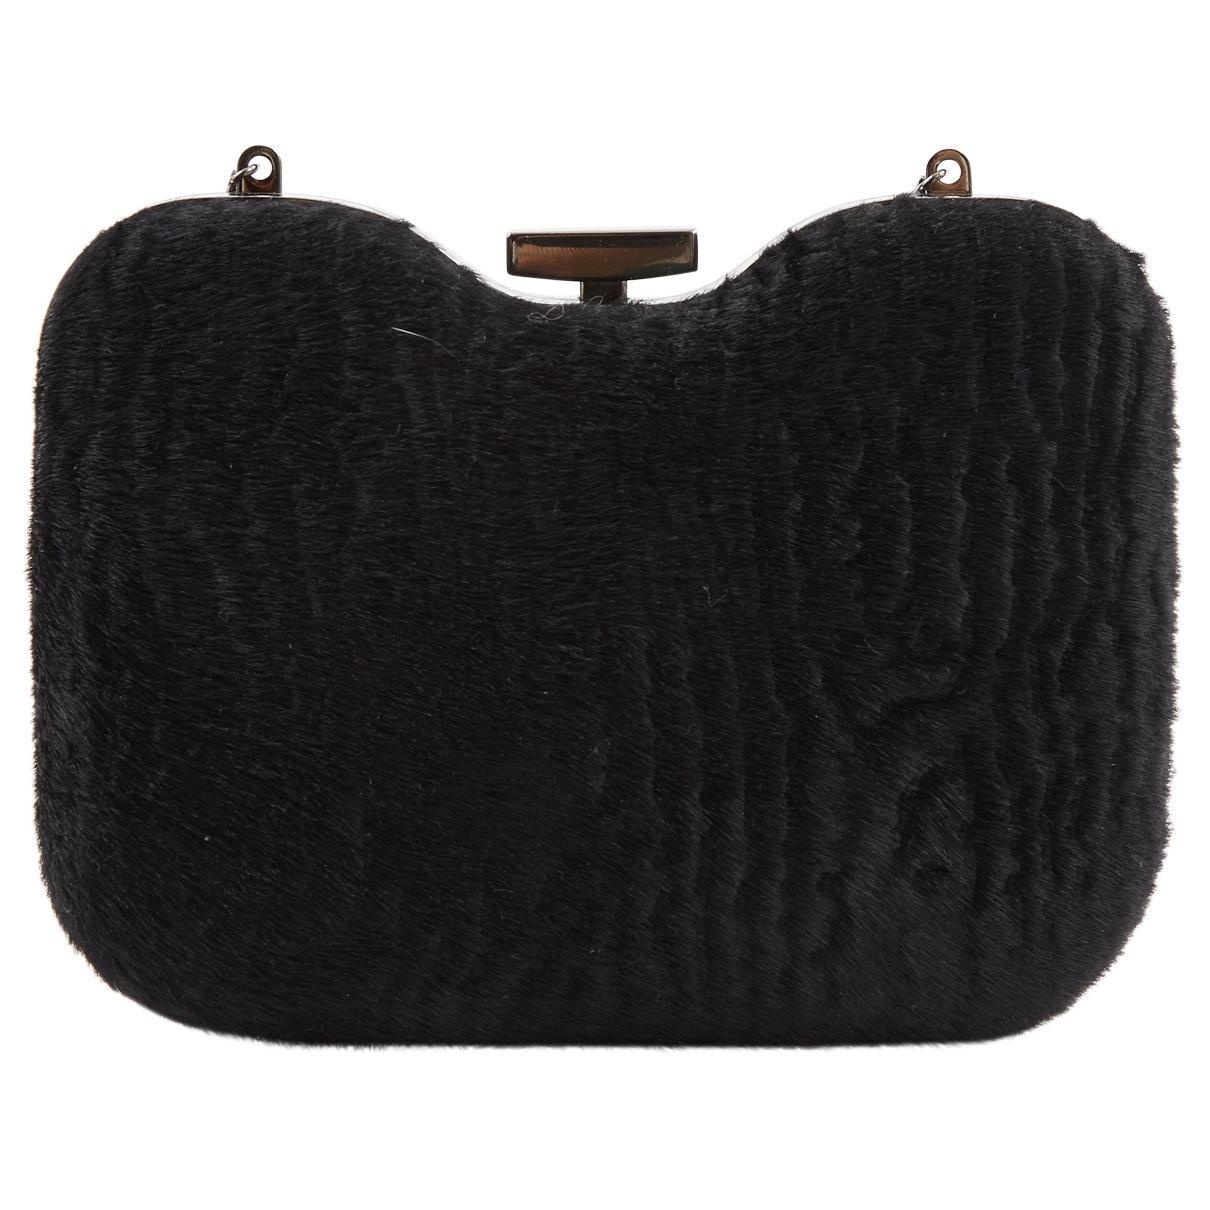 4527287fc465 Lyst - Fendi Pre-owned Black Pony-style Calfskin Clutch Bags in Black